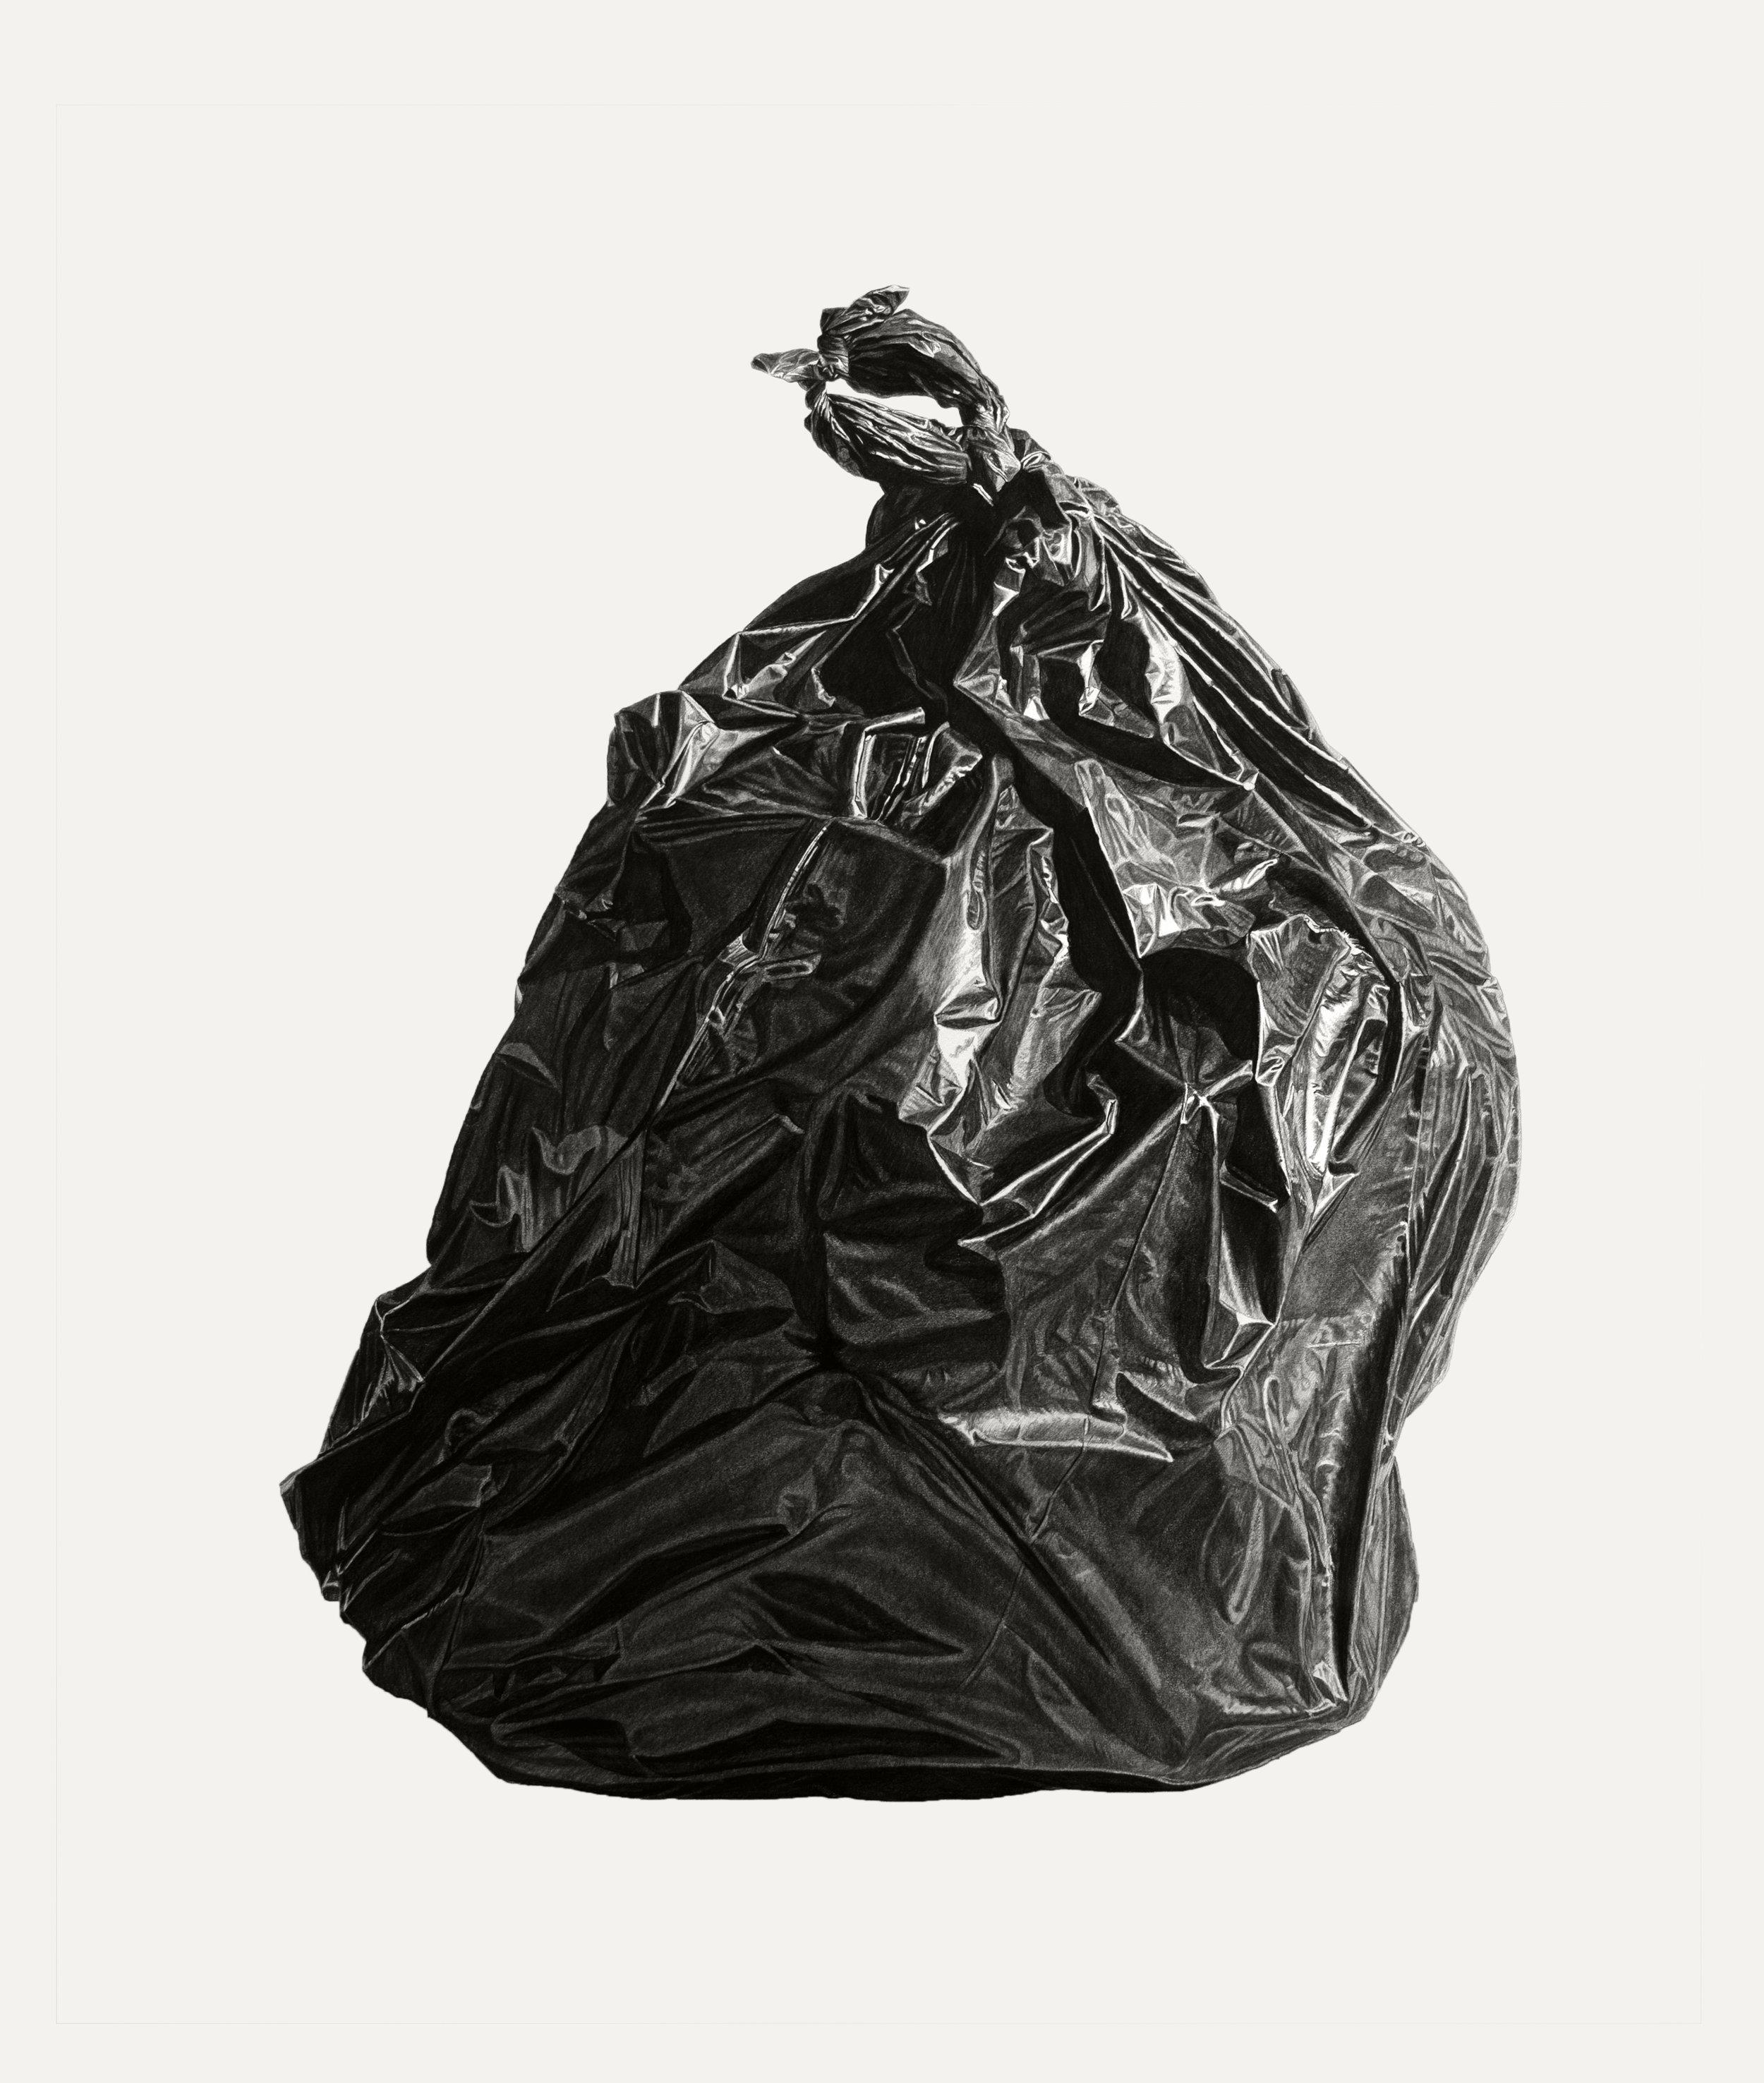 Neighborhood Still Life #6 (Black Bag)